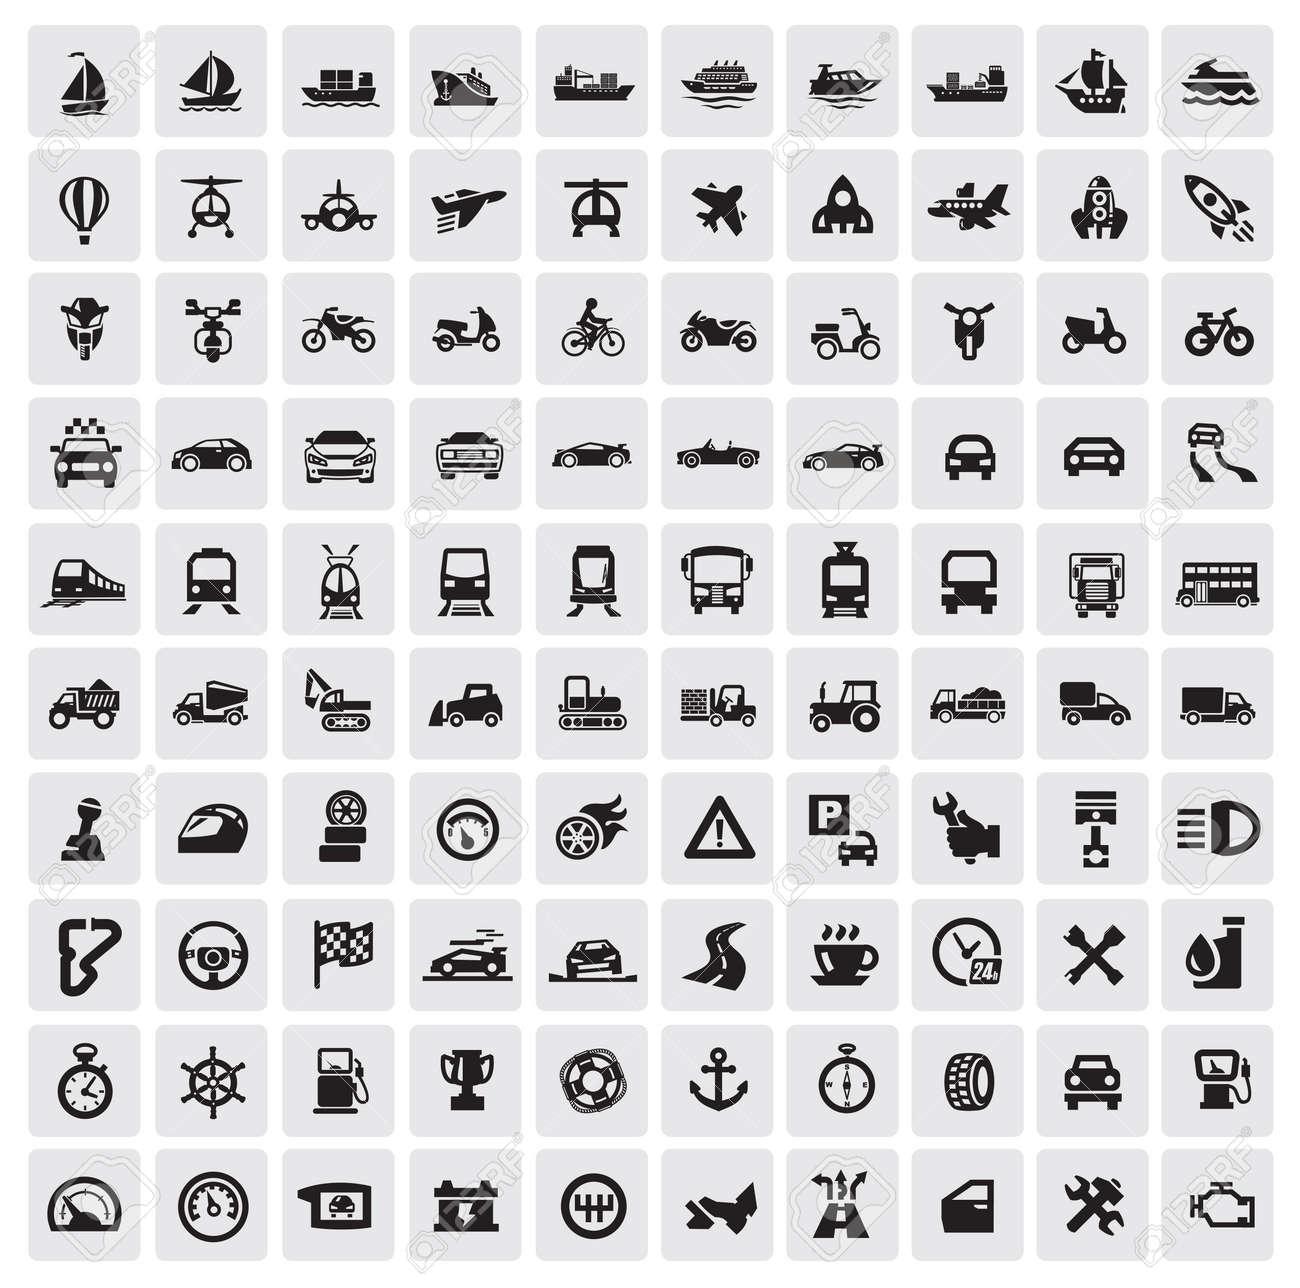 big transportation icons - 15963359